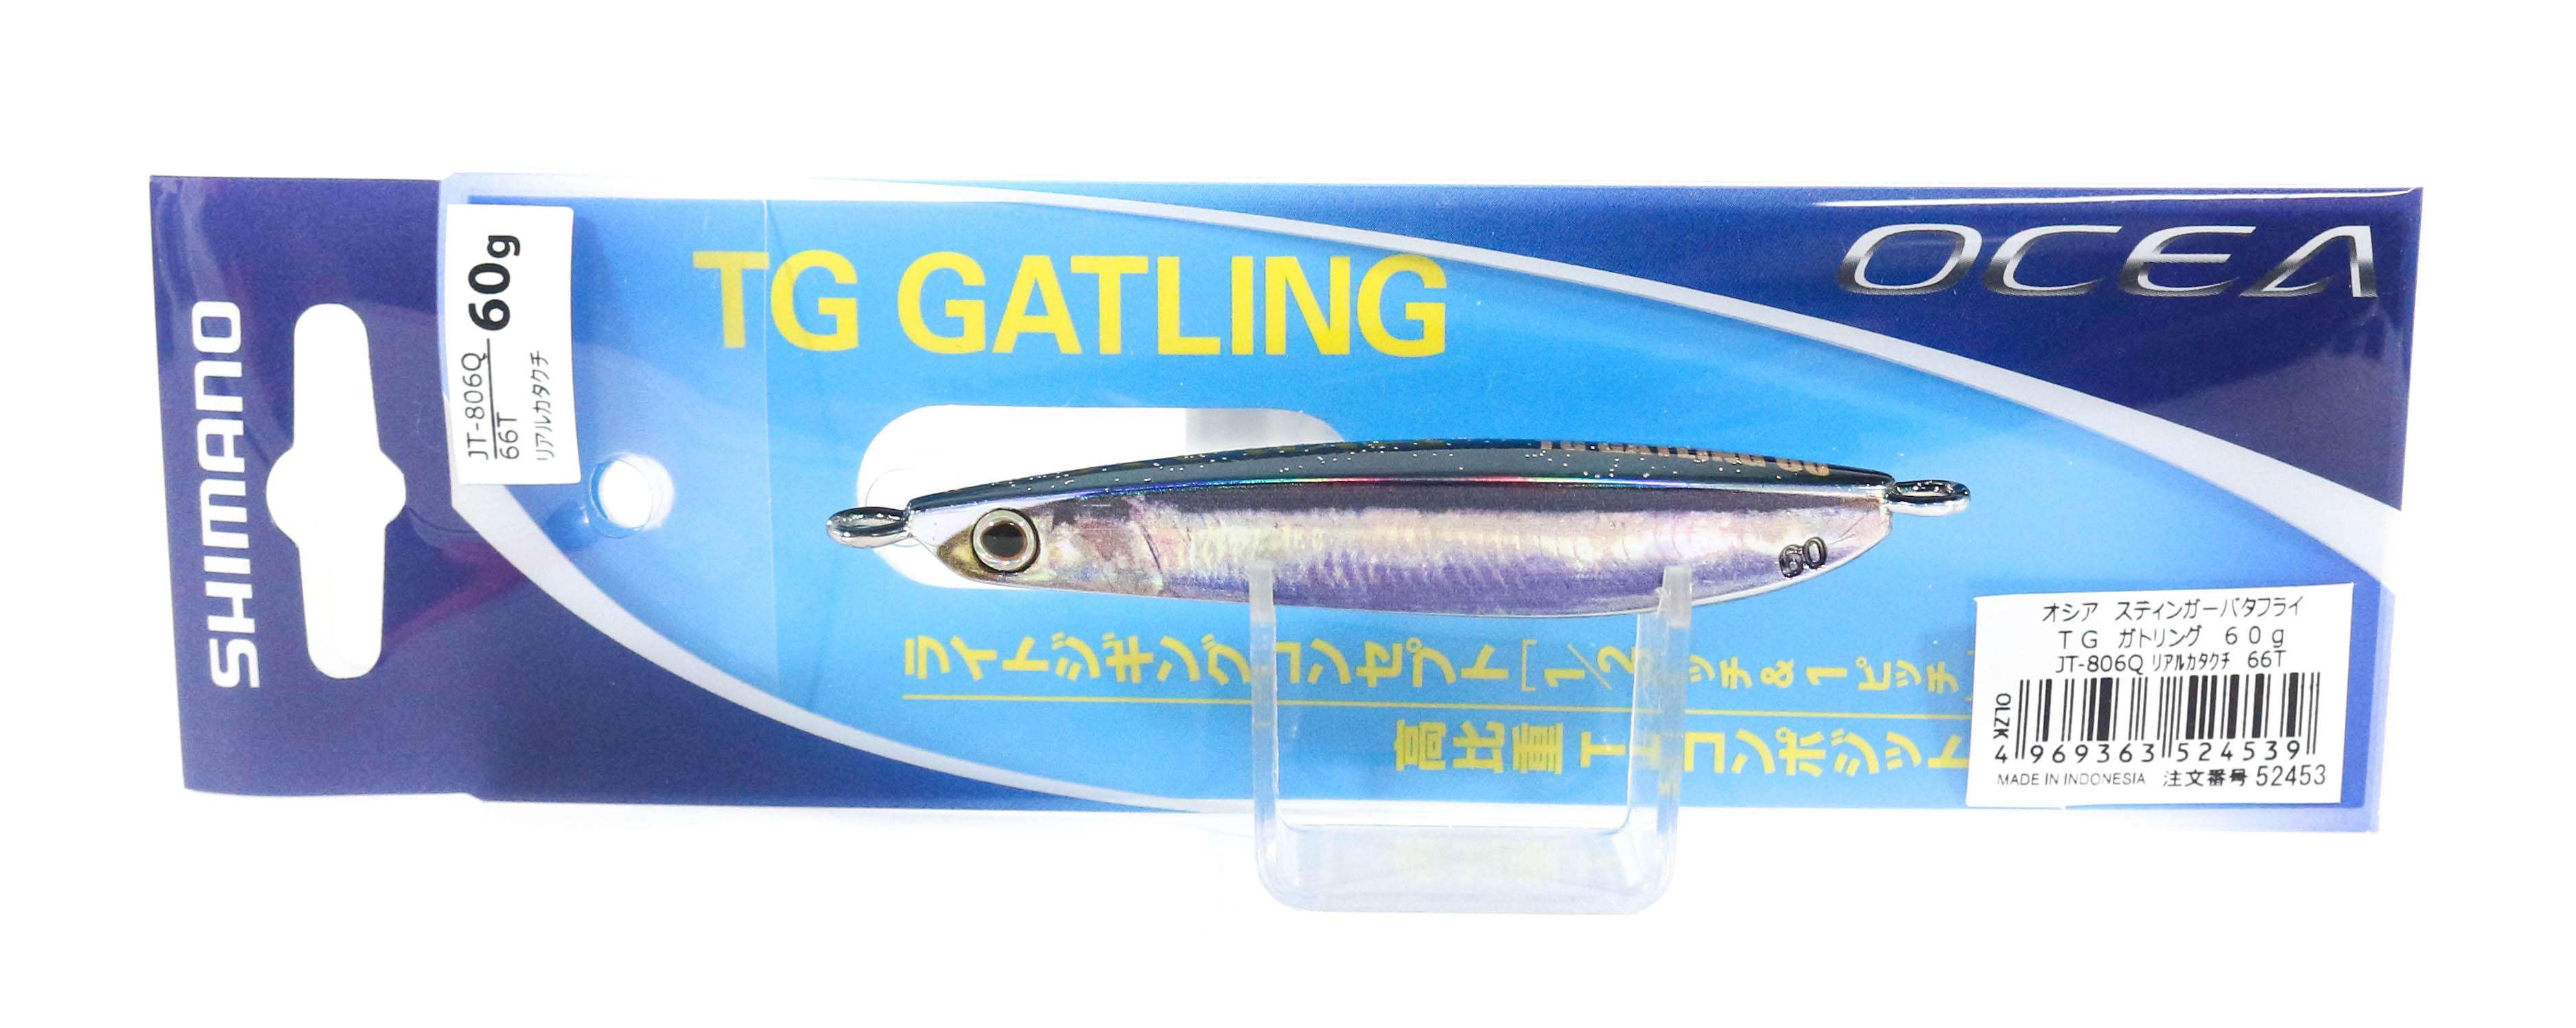 Shimano JT-806Q Metal Jig TG Gatling 60 grams 66T 524539